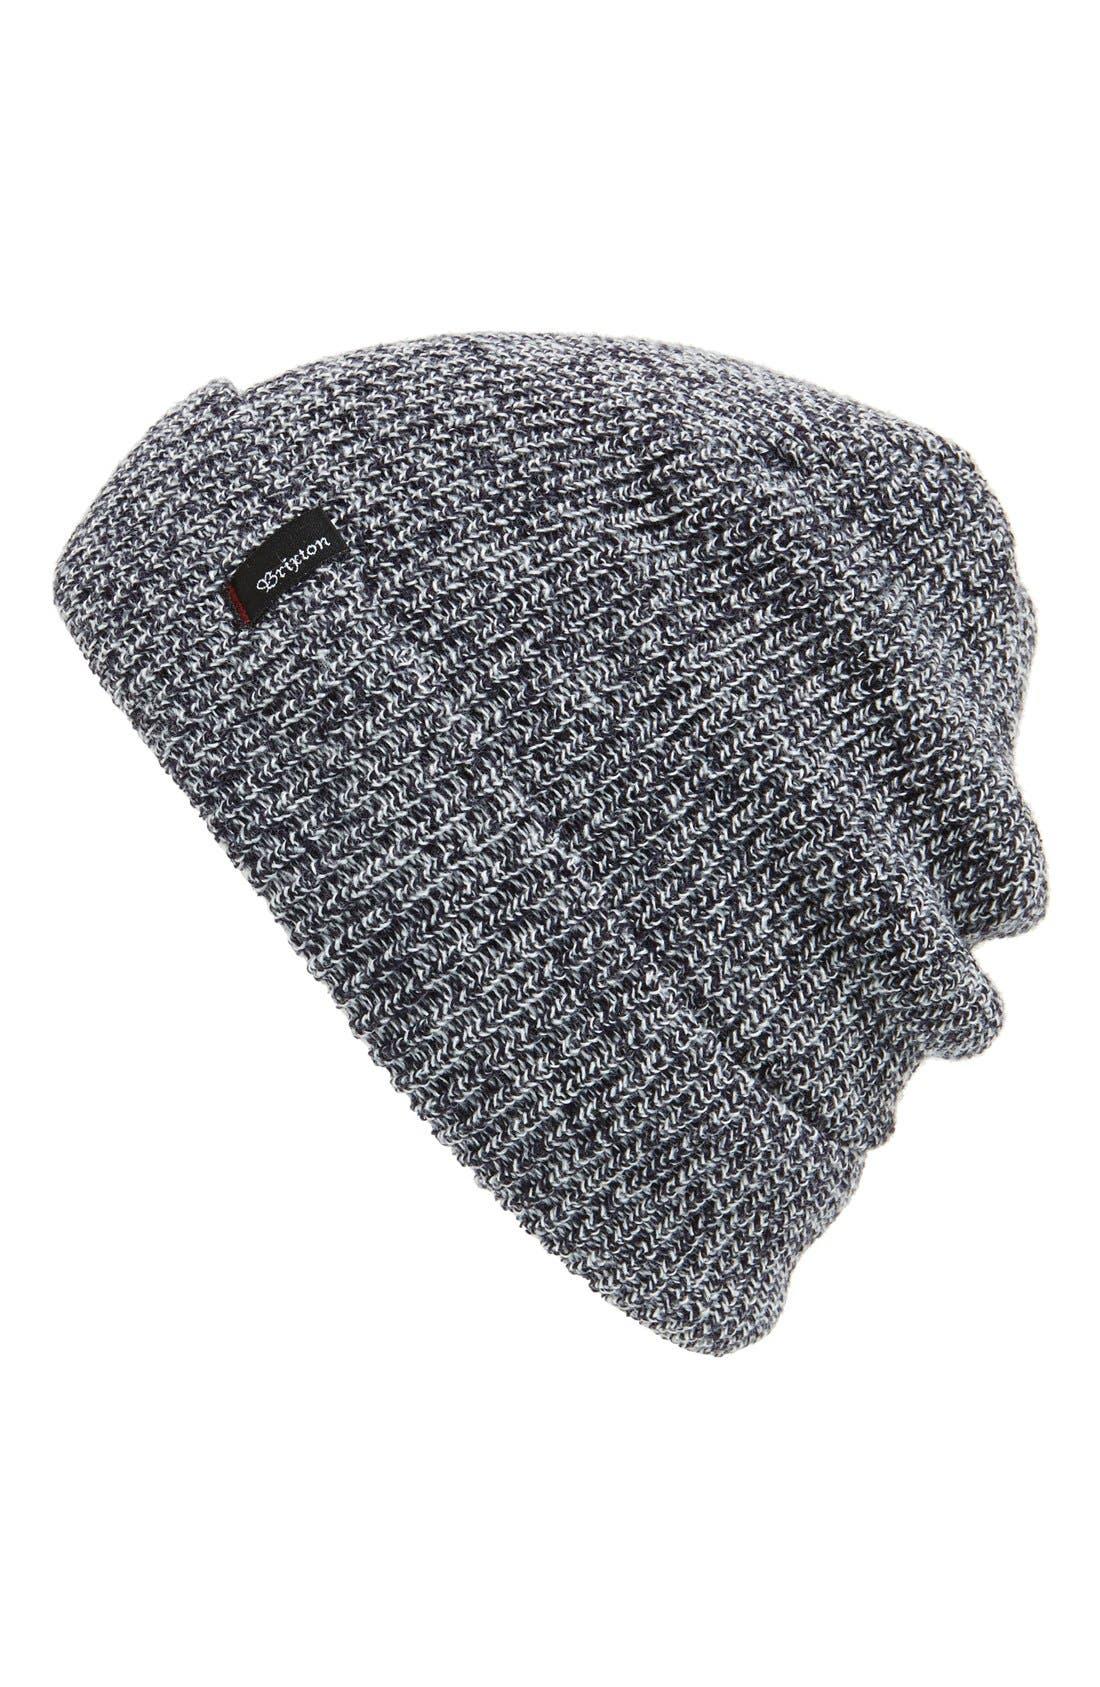 Alternate Image 1 Selected - Brixton 'Heist' Rib Knit Cap